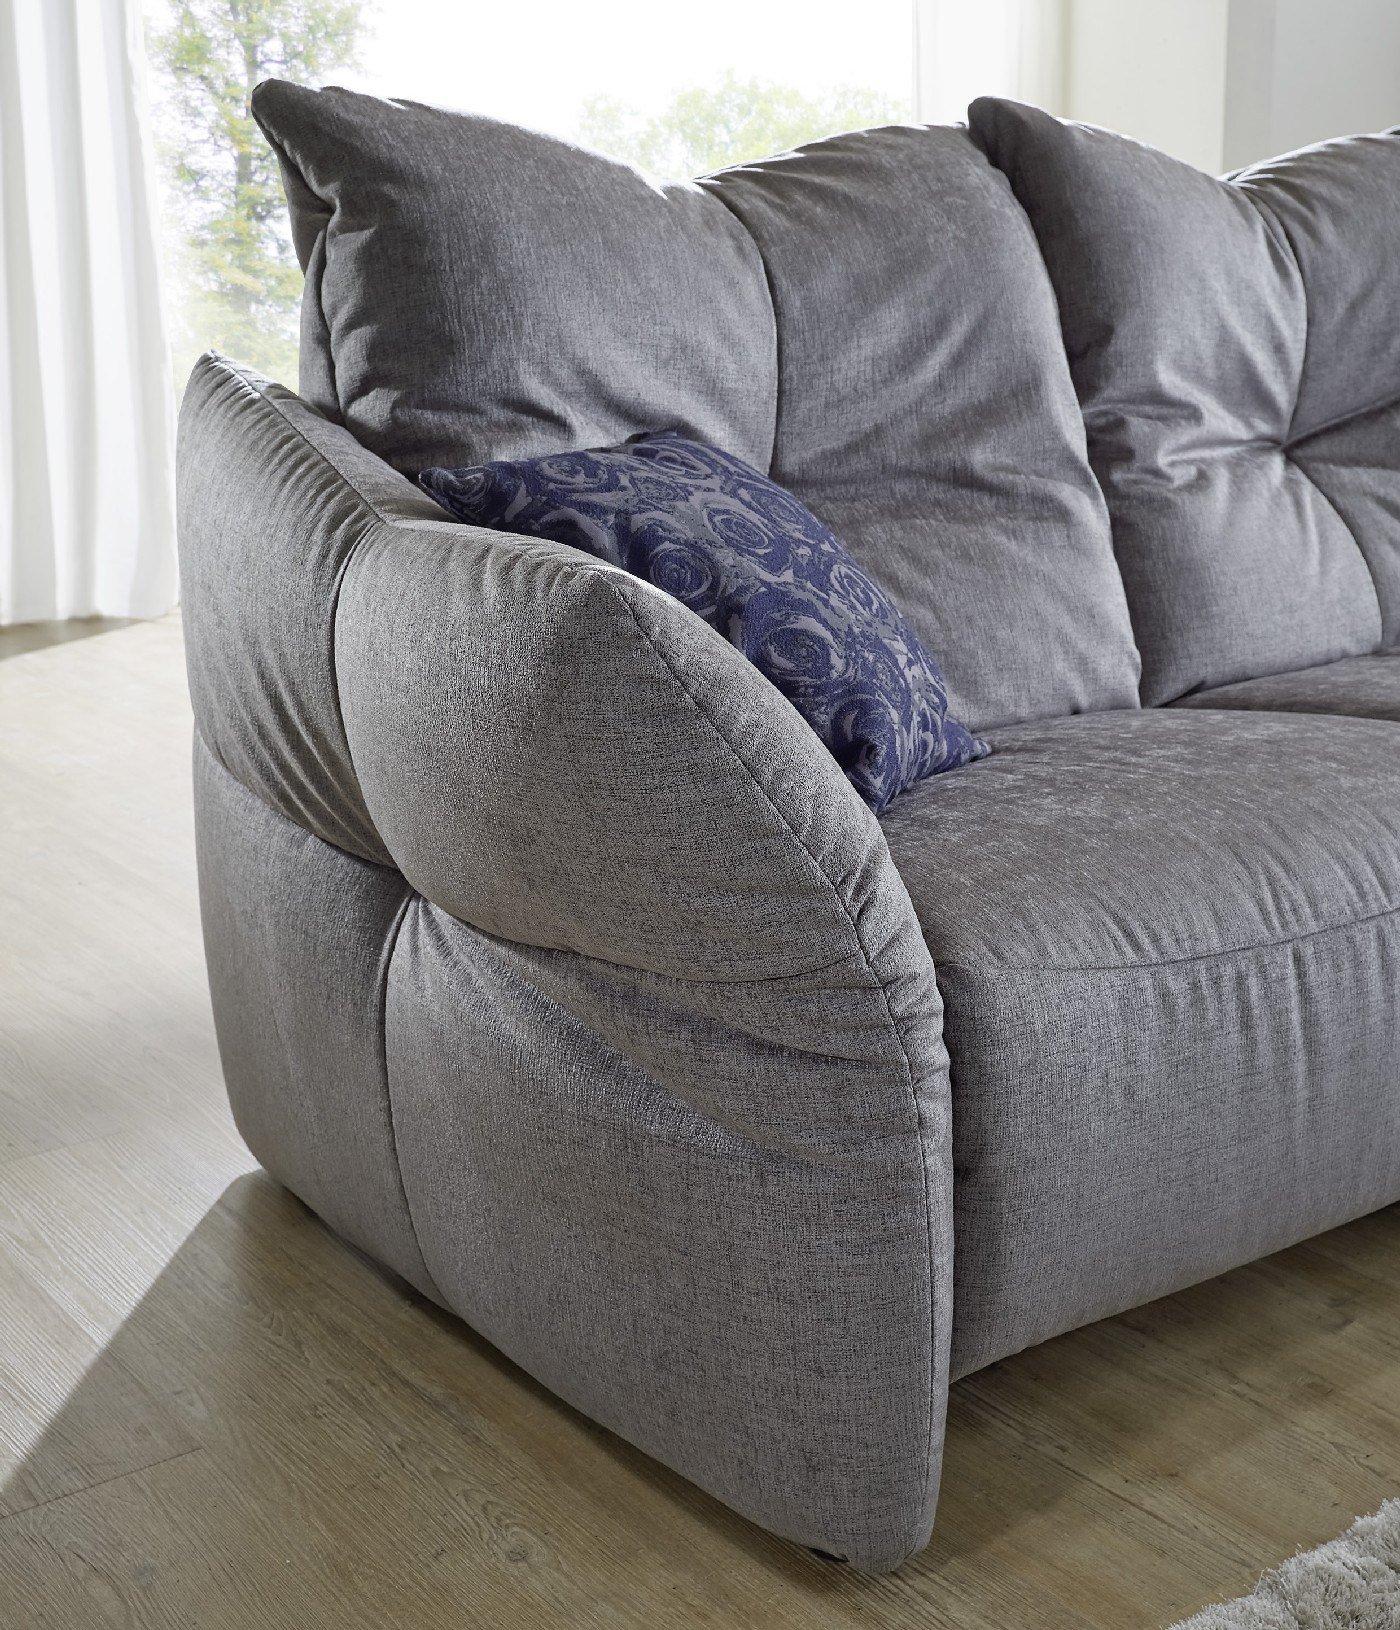 k w polsterm bel paradiso ecksofa grau m bel letz ihr. Black Bedroom Furniture Sets. Home Design Ideas